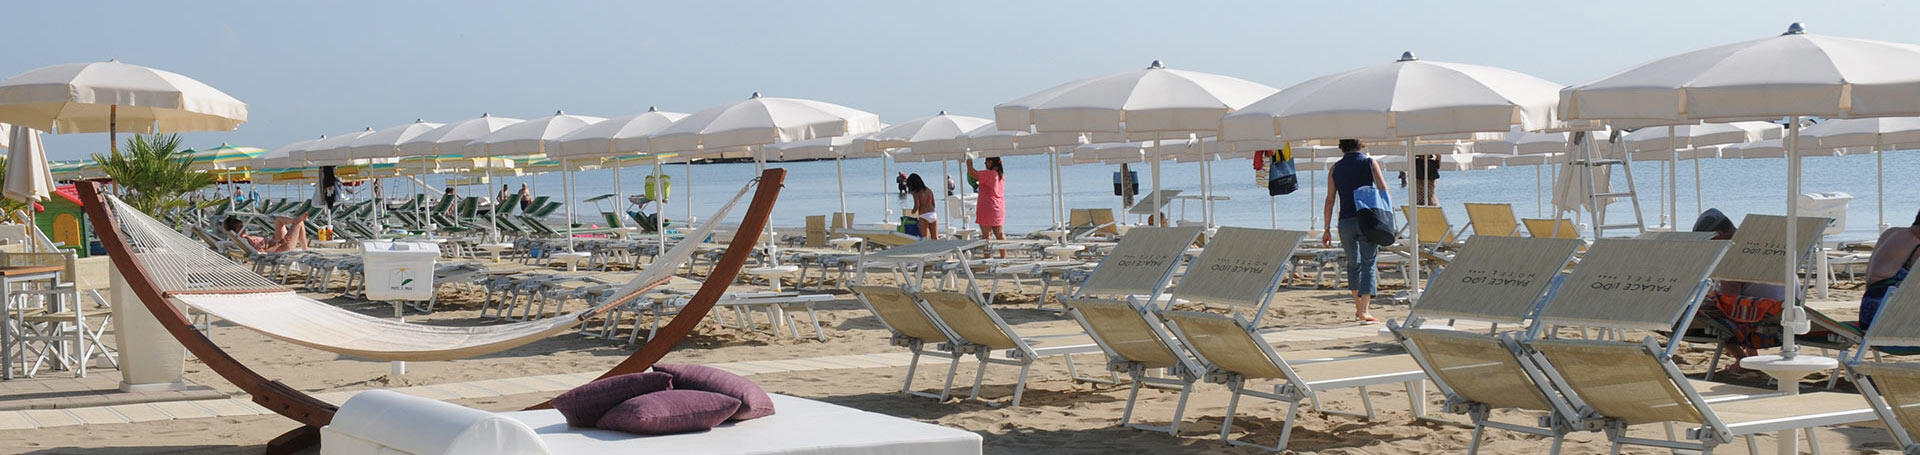 palacelidohotel fr plage-privee-lido-di-savio 011